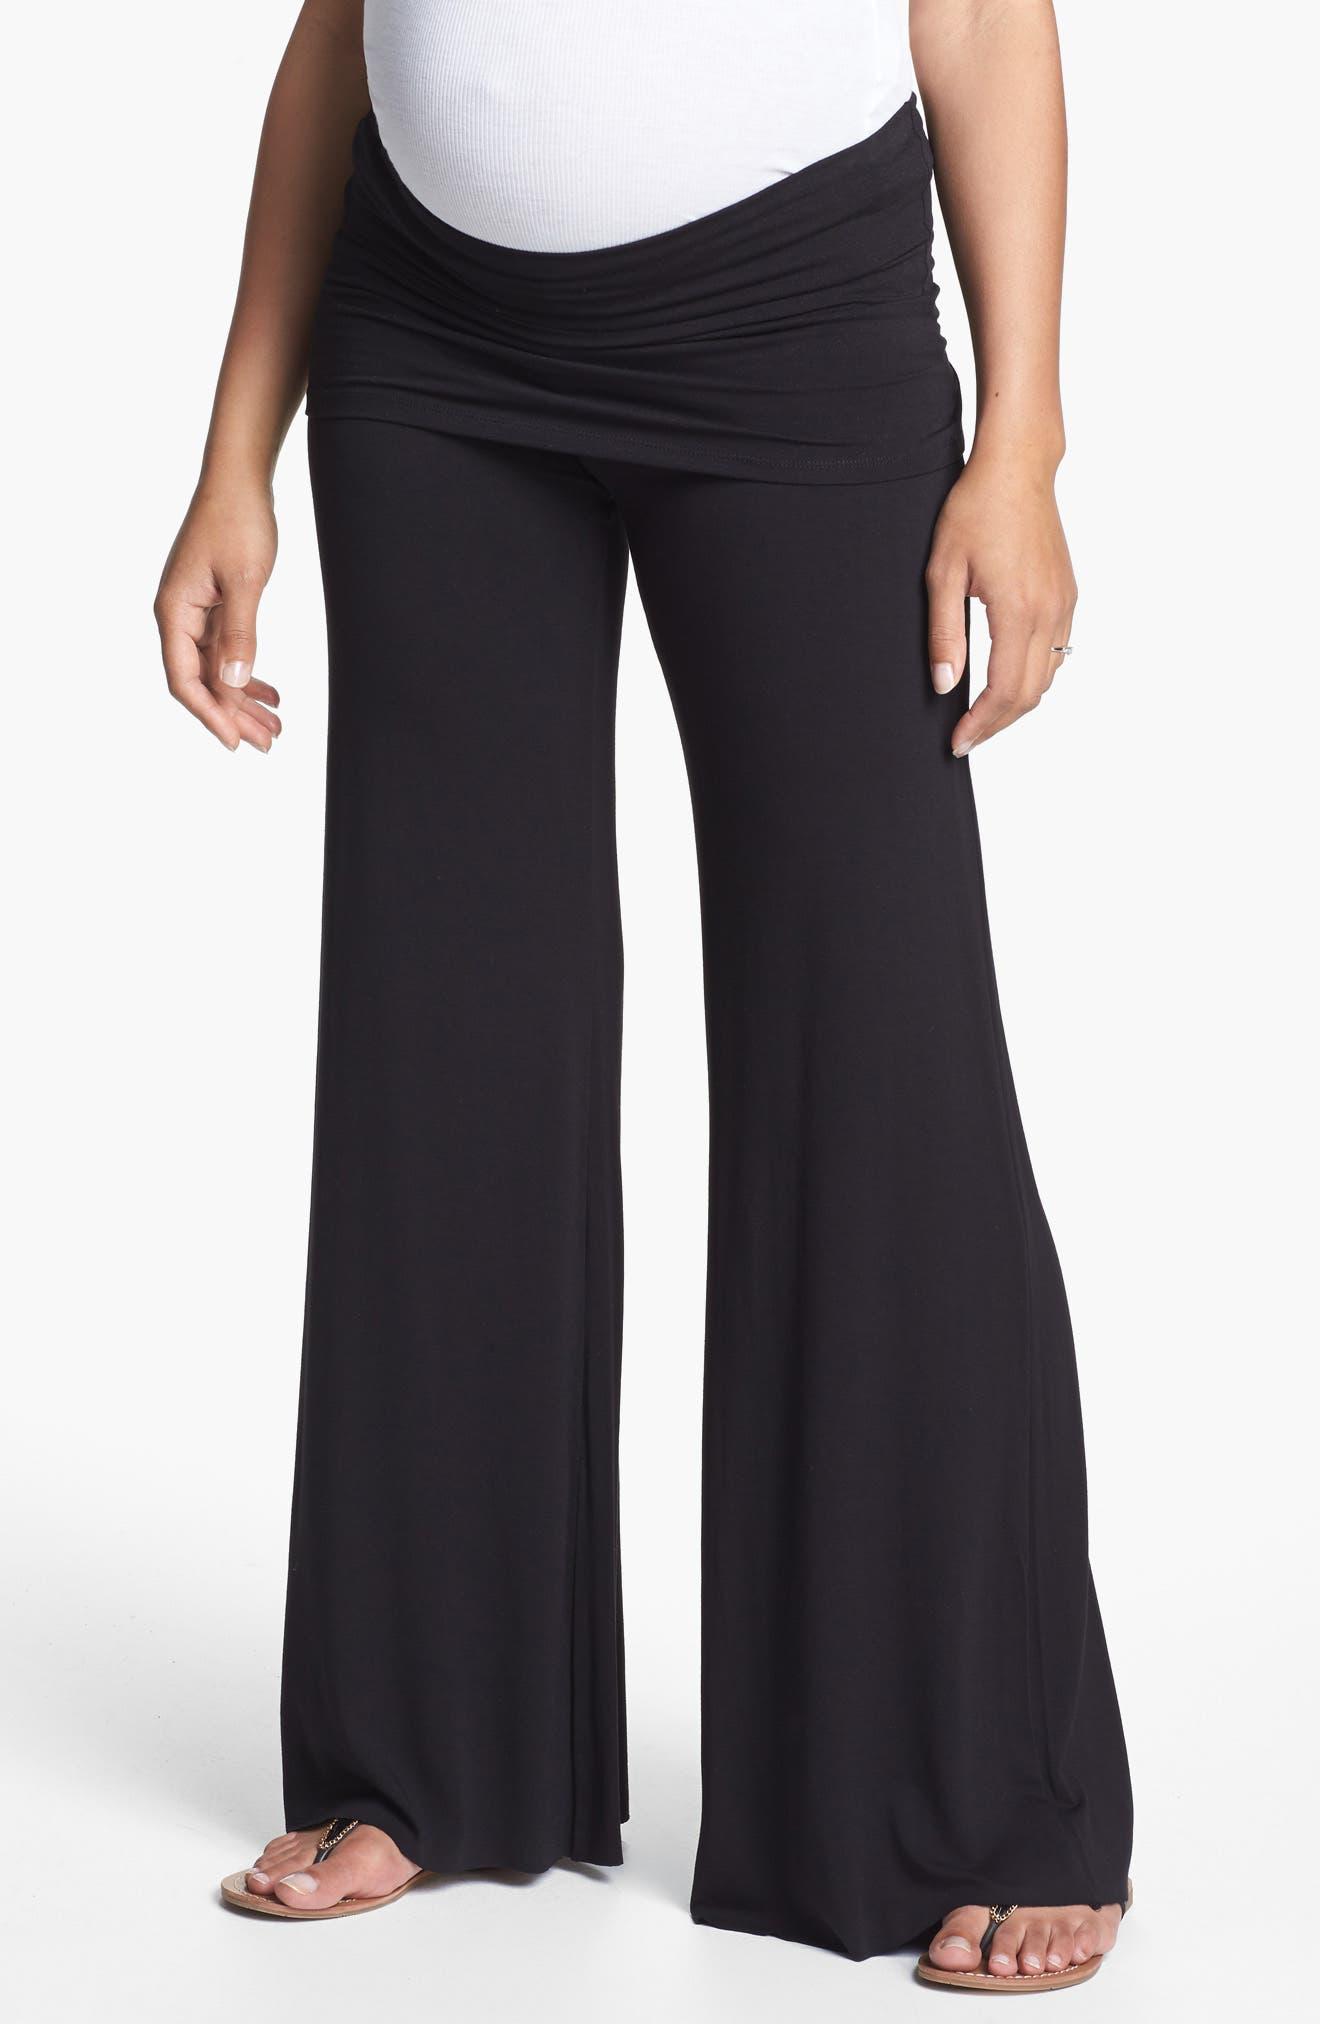 MATERNAL AMERICA Knit Flare Leg Maternity Pants, Main, color, BLACK